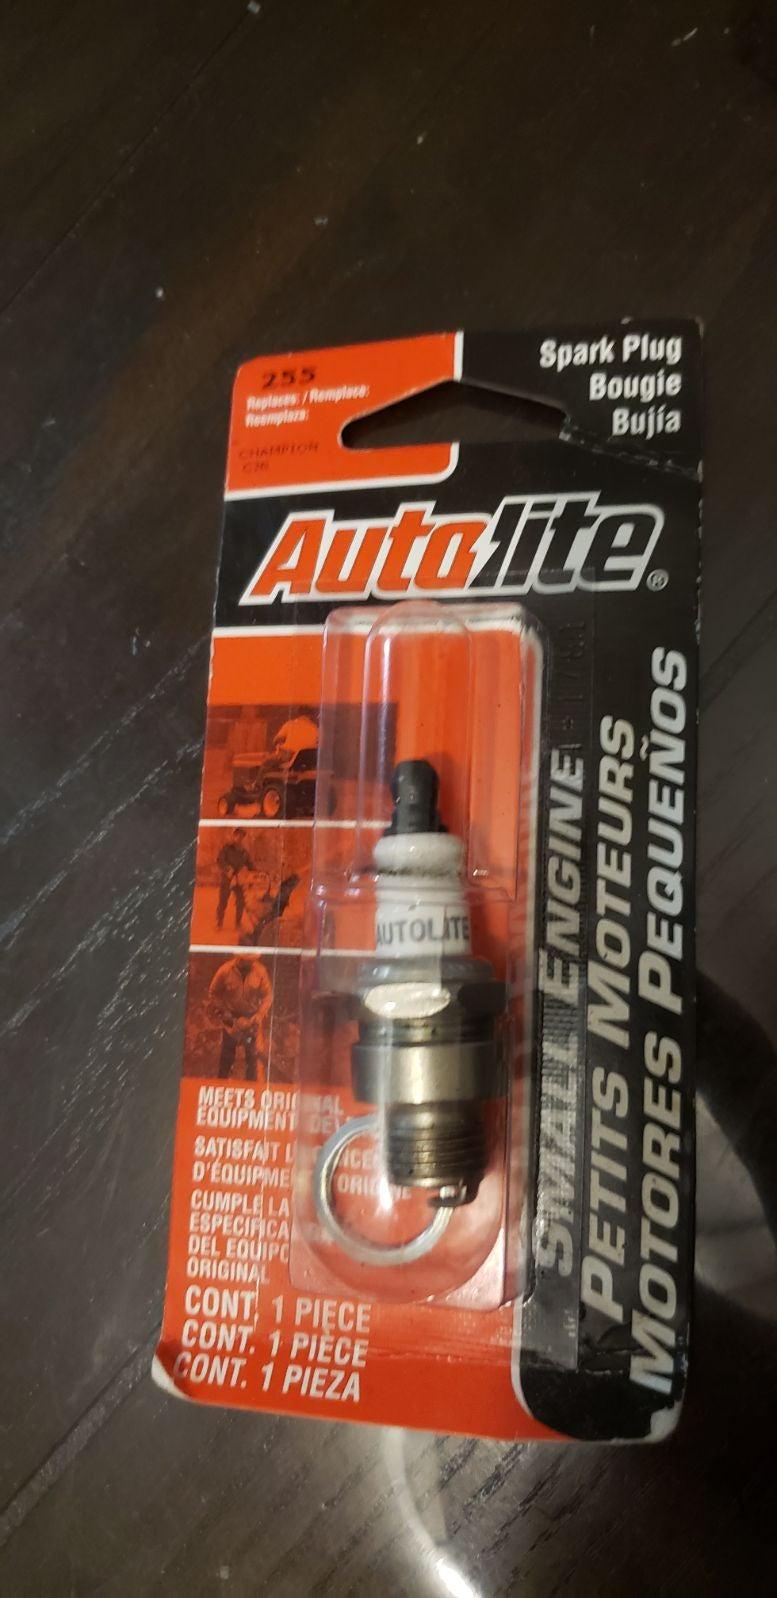 Autolite spark plugs. 8 total